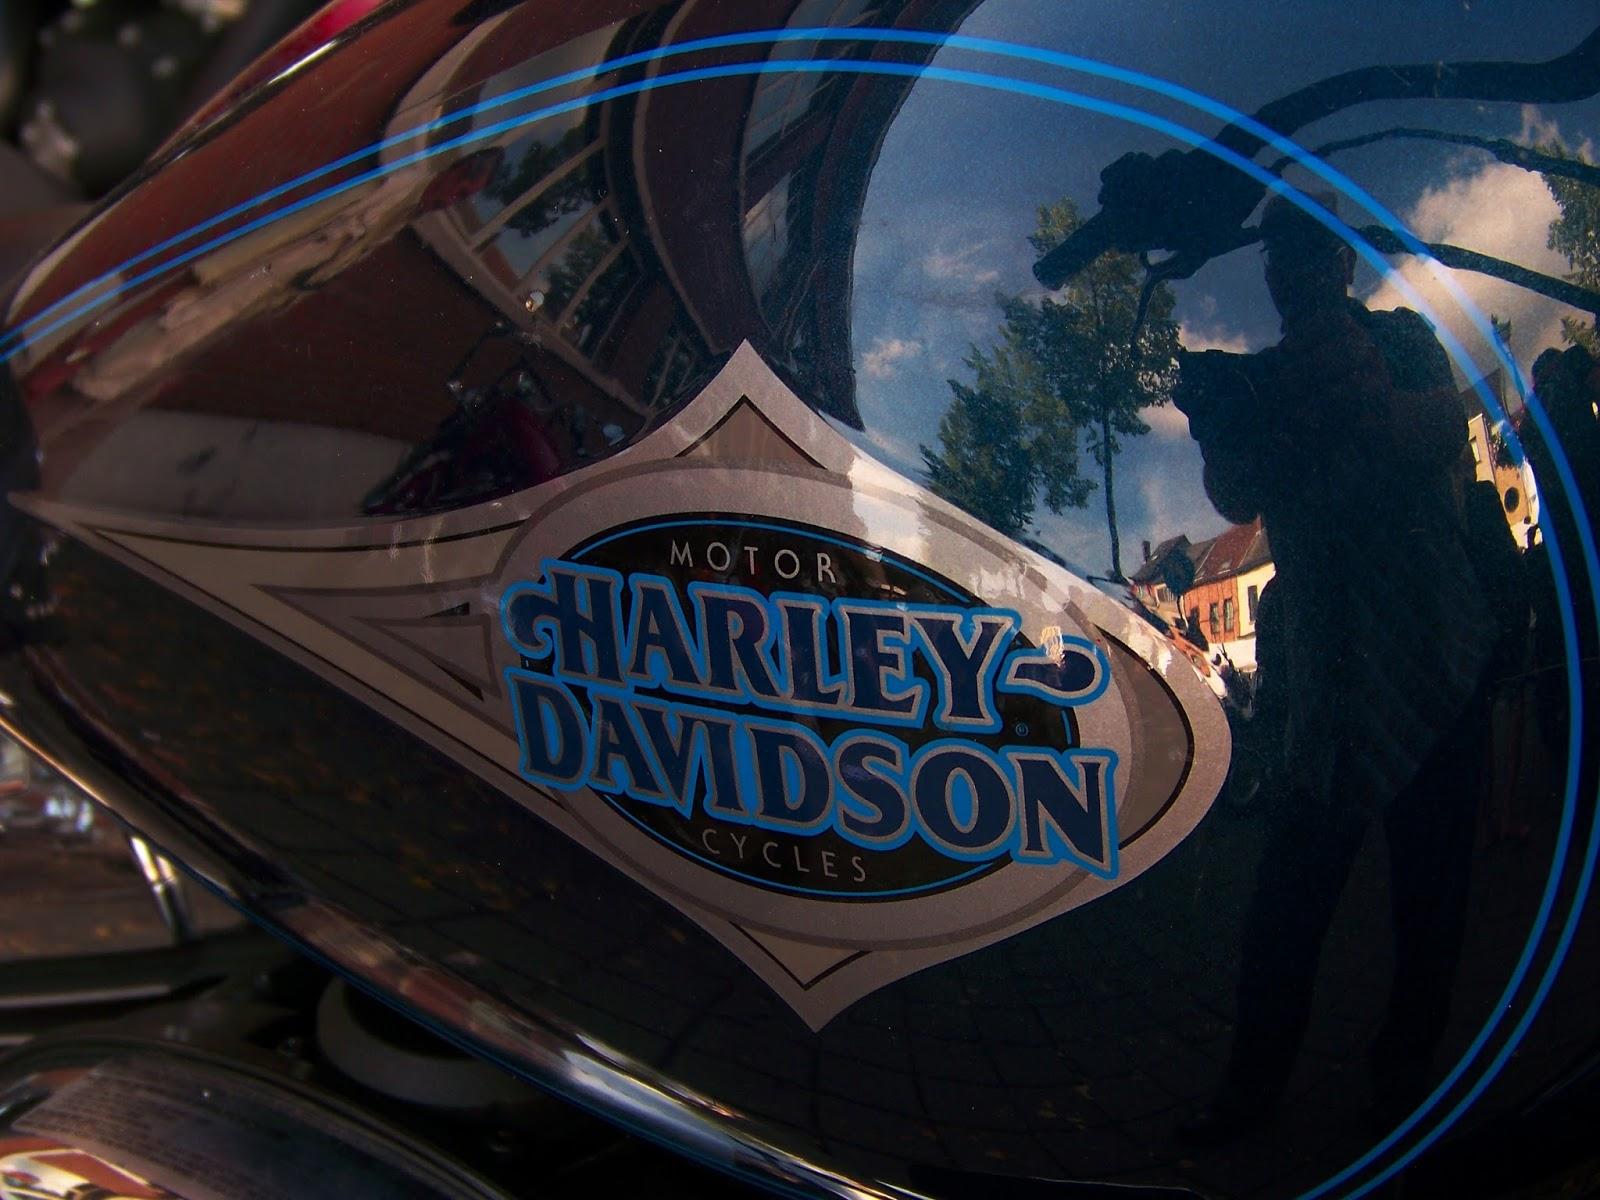 harley davidson tank logo Harley Davidson tank logo's